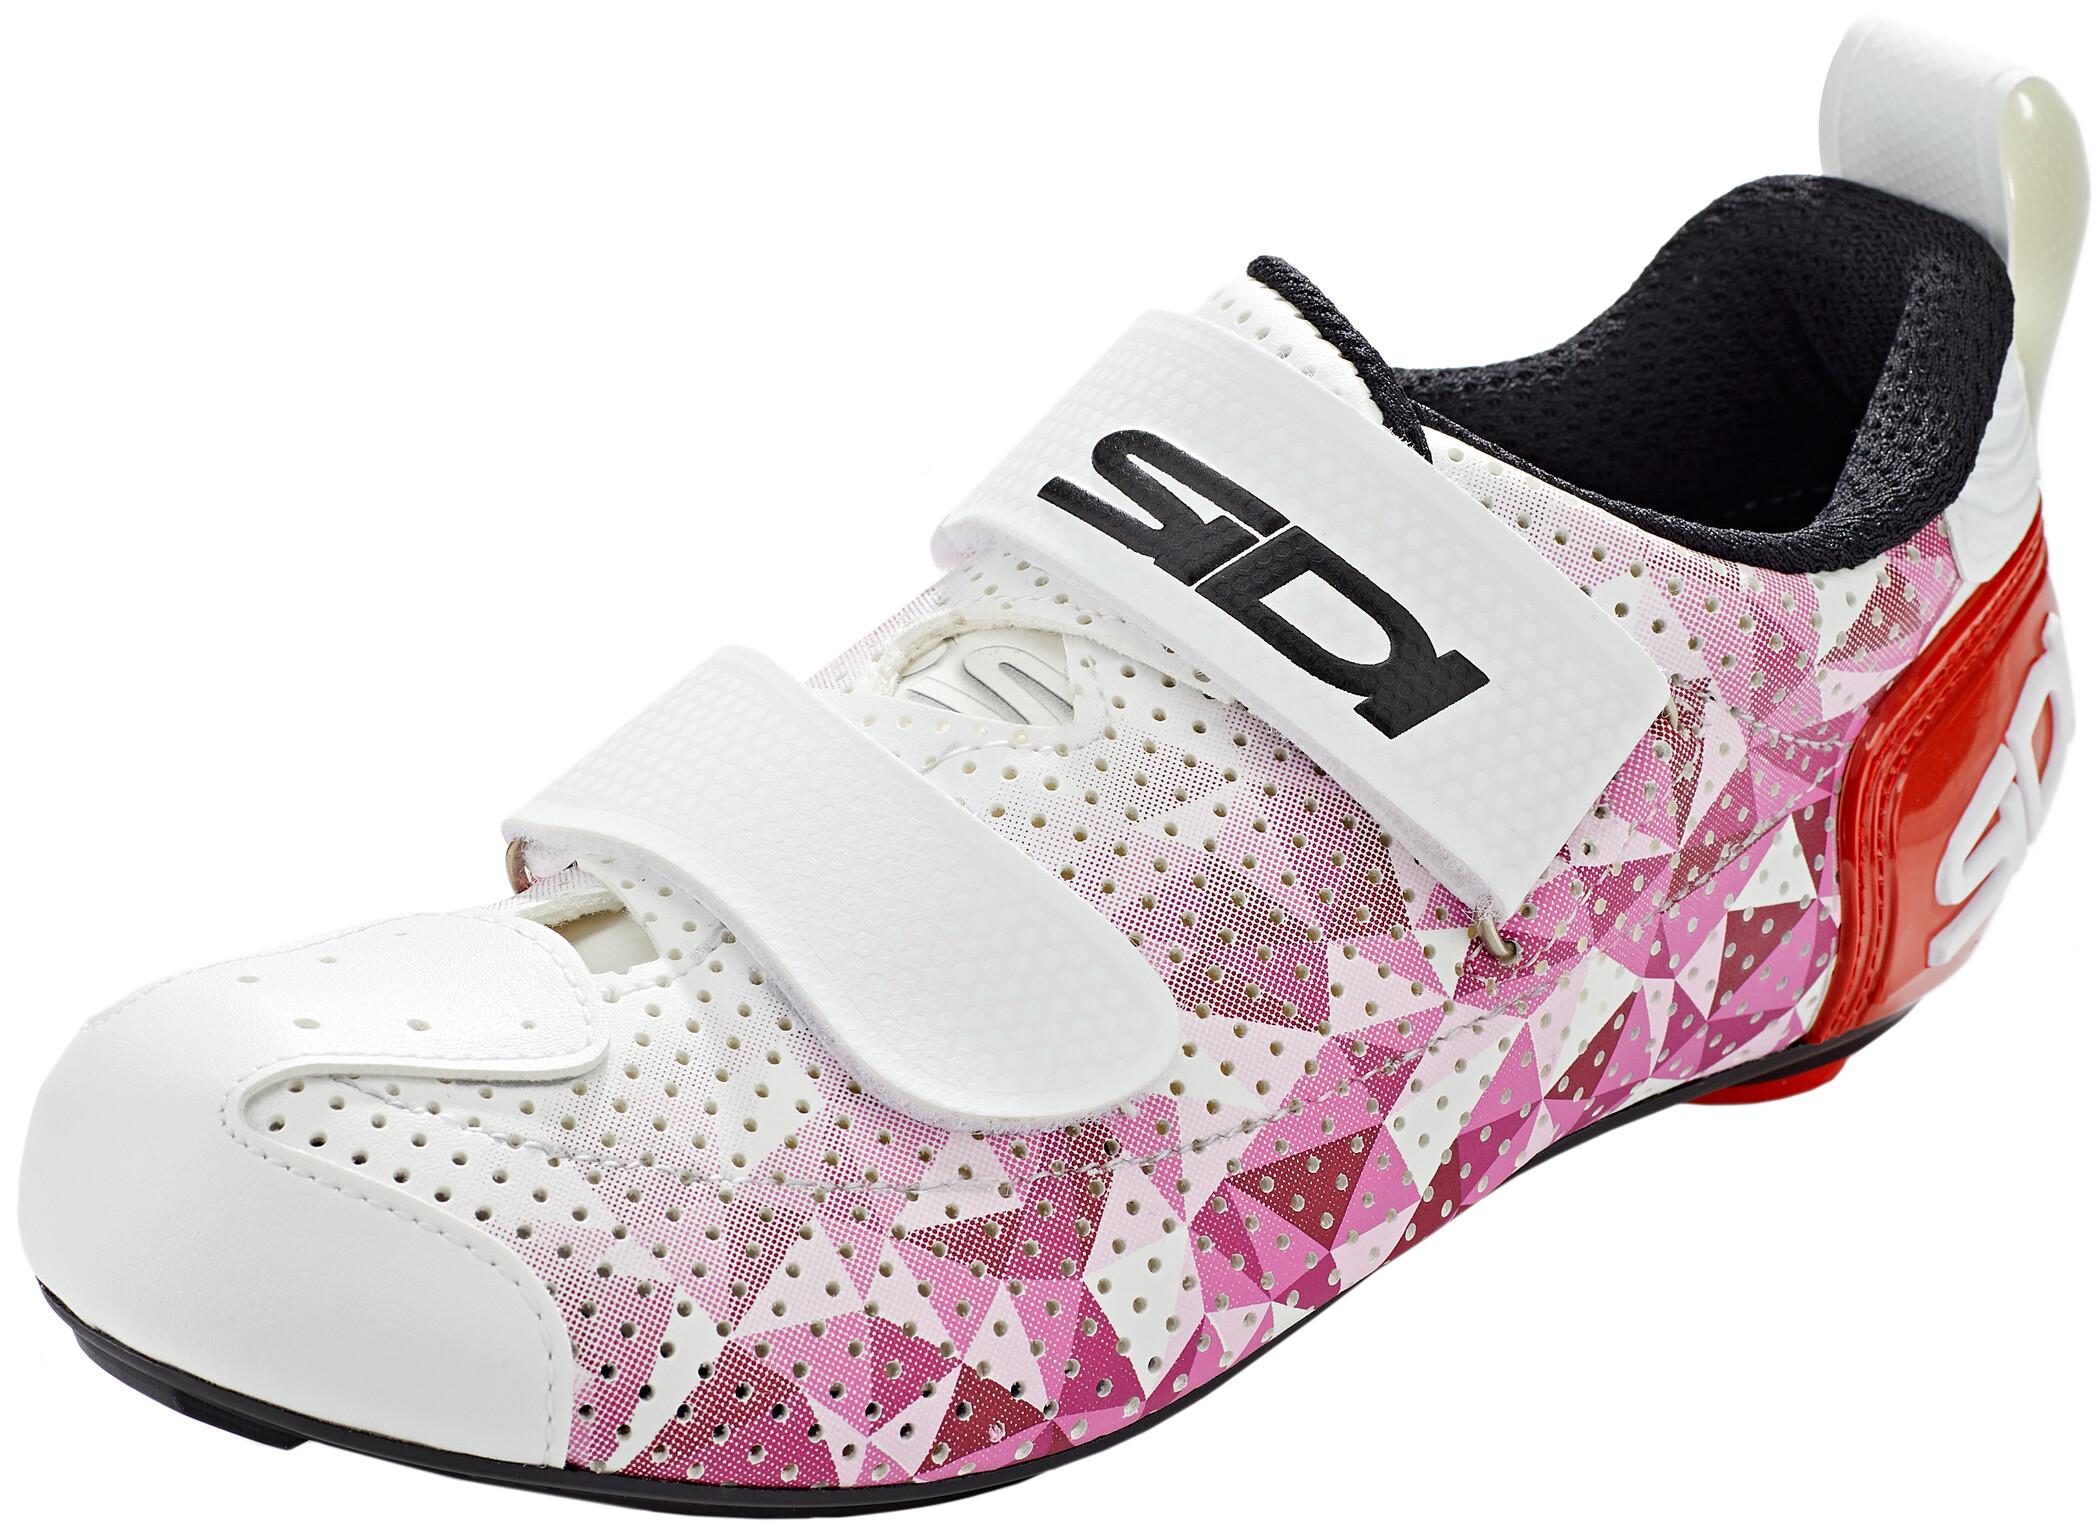 Sidi T-5 Air Schuhe Damen pink//red//White 2020 Rad-Schuhe Radsport-Schuhe